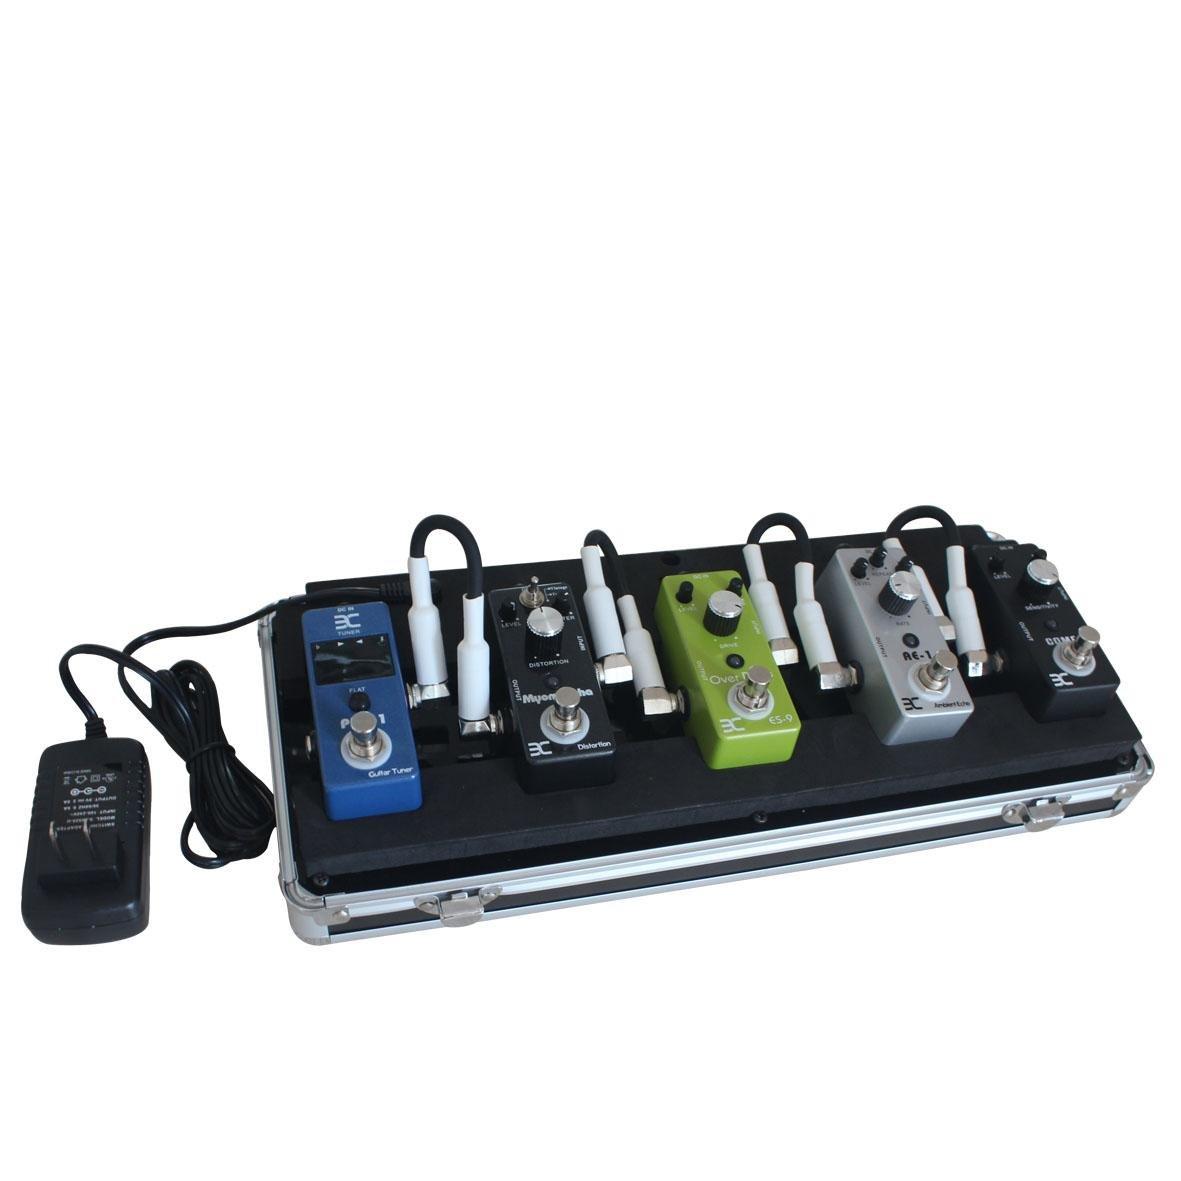 ENO EX QQ Case 5-Pedal Pedalboard/Electronic Guitar Effects Pedals Flight Case by Effects Pedals Flight Case (Image #8)